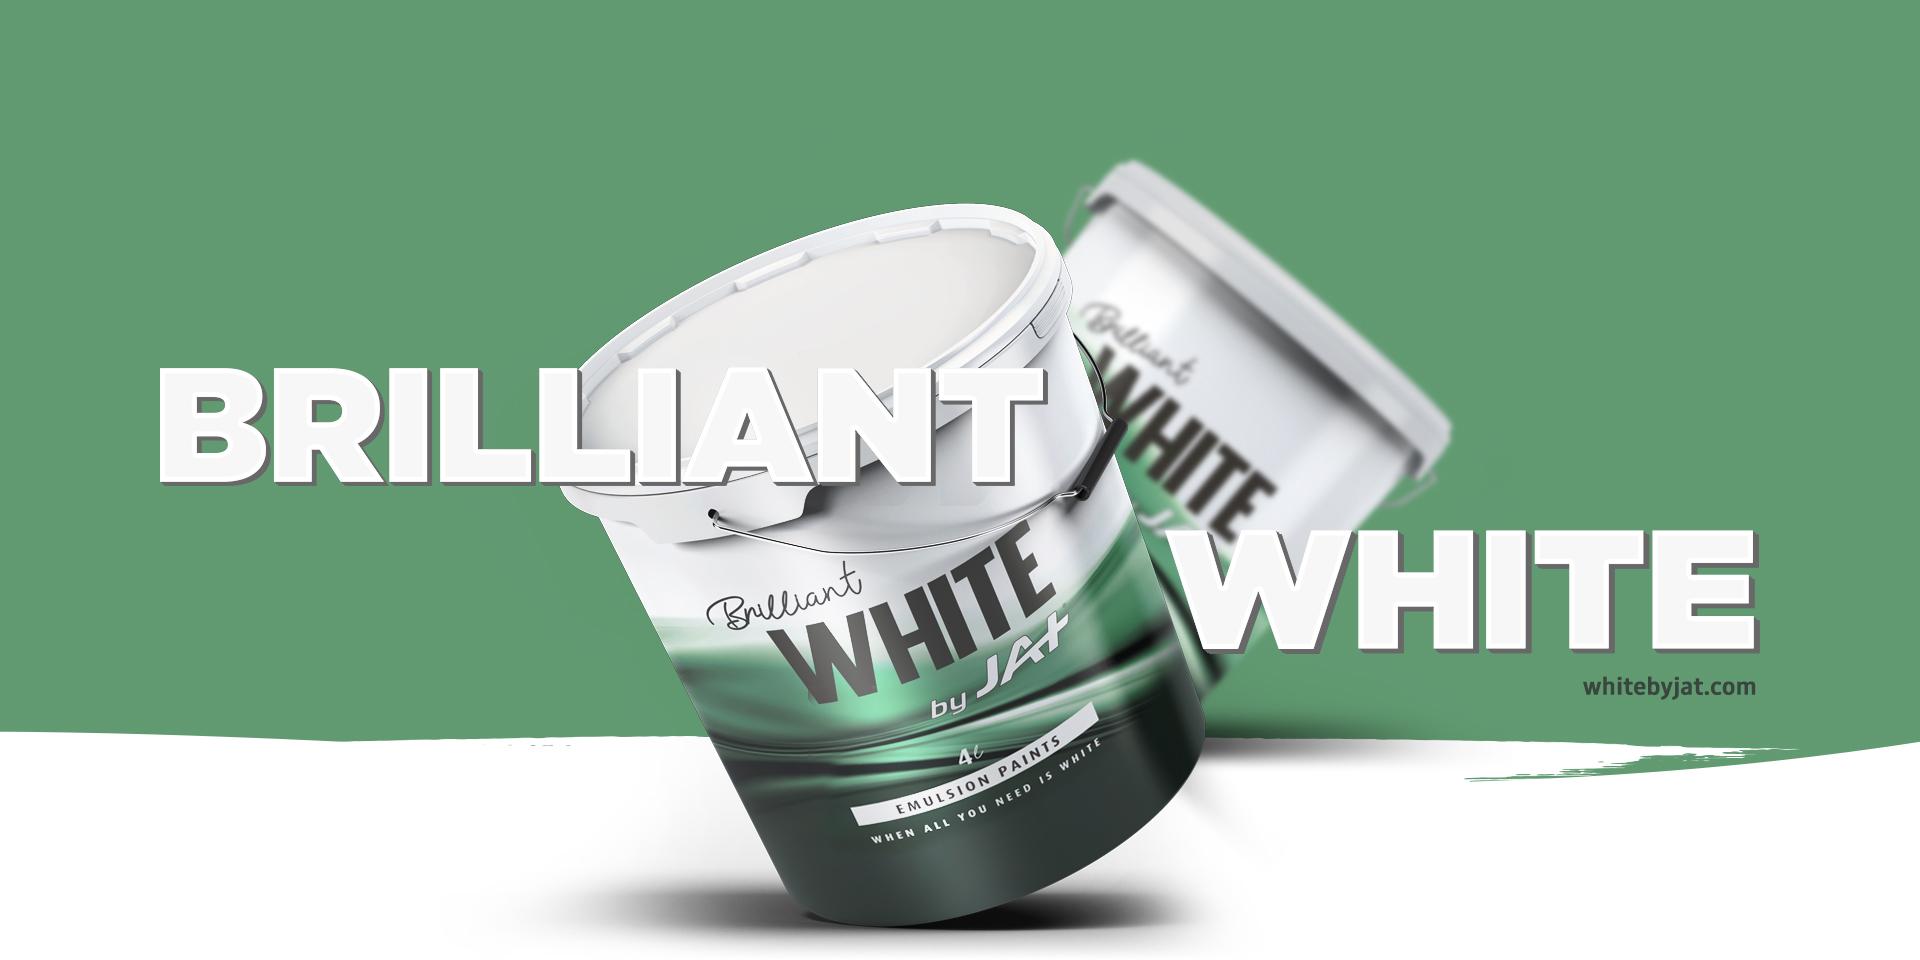 jat-white